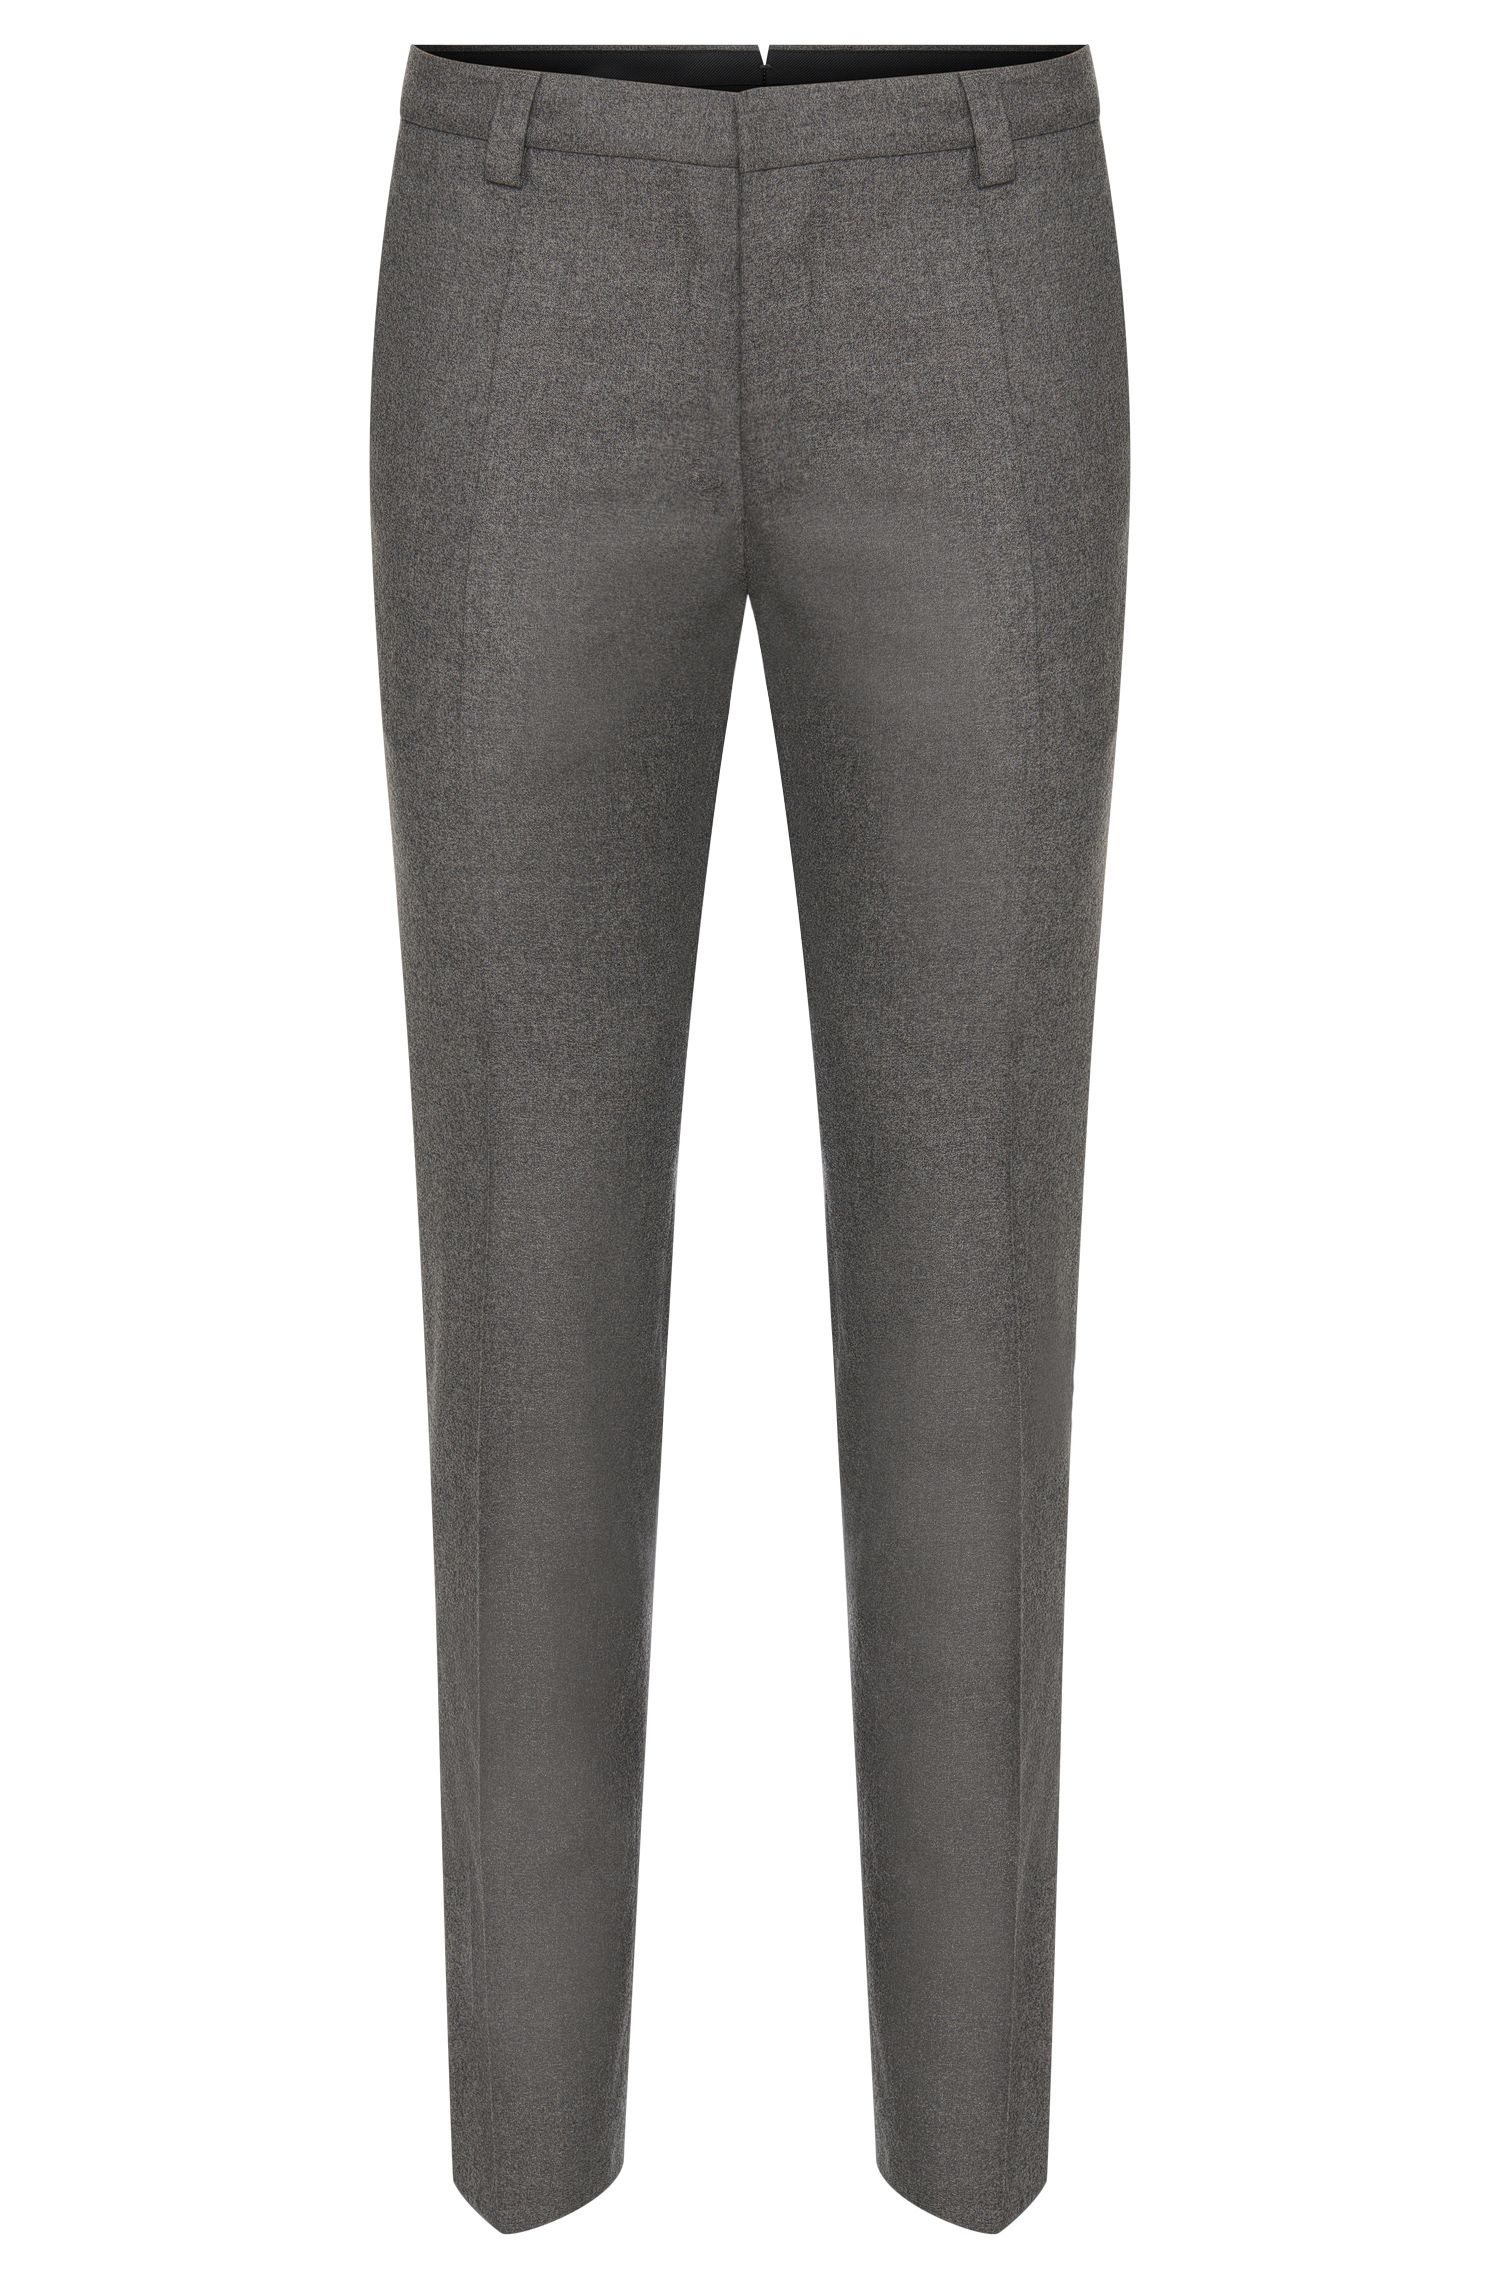 'Alec' | Slim Fit, Stretch Virgin Wool Cashmere Dress Pants